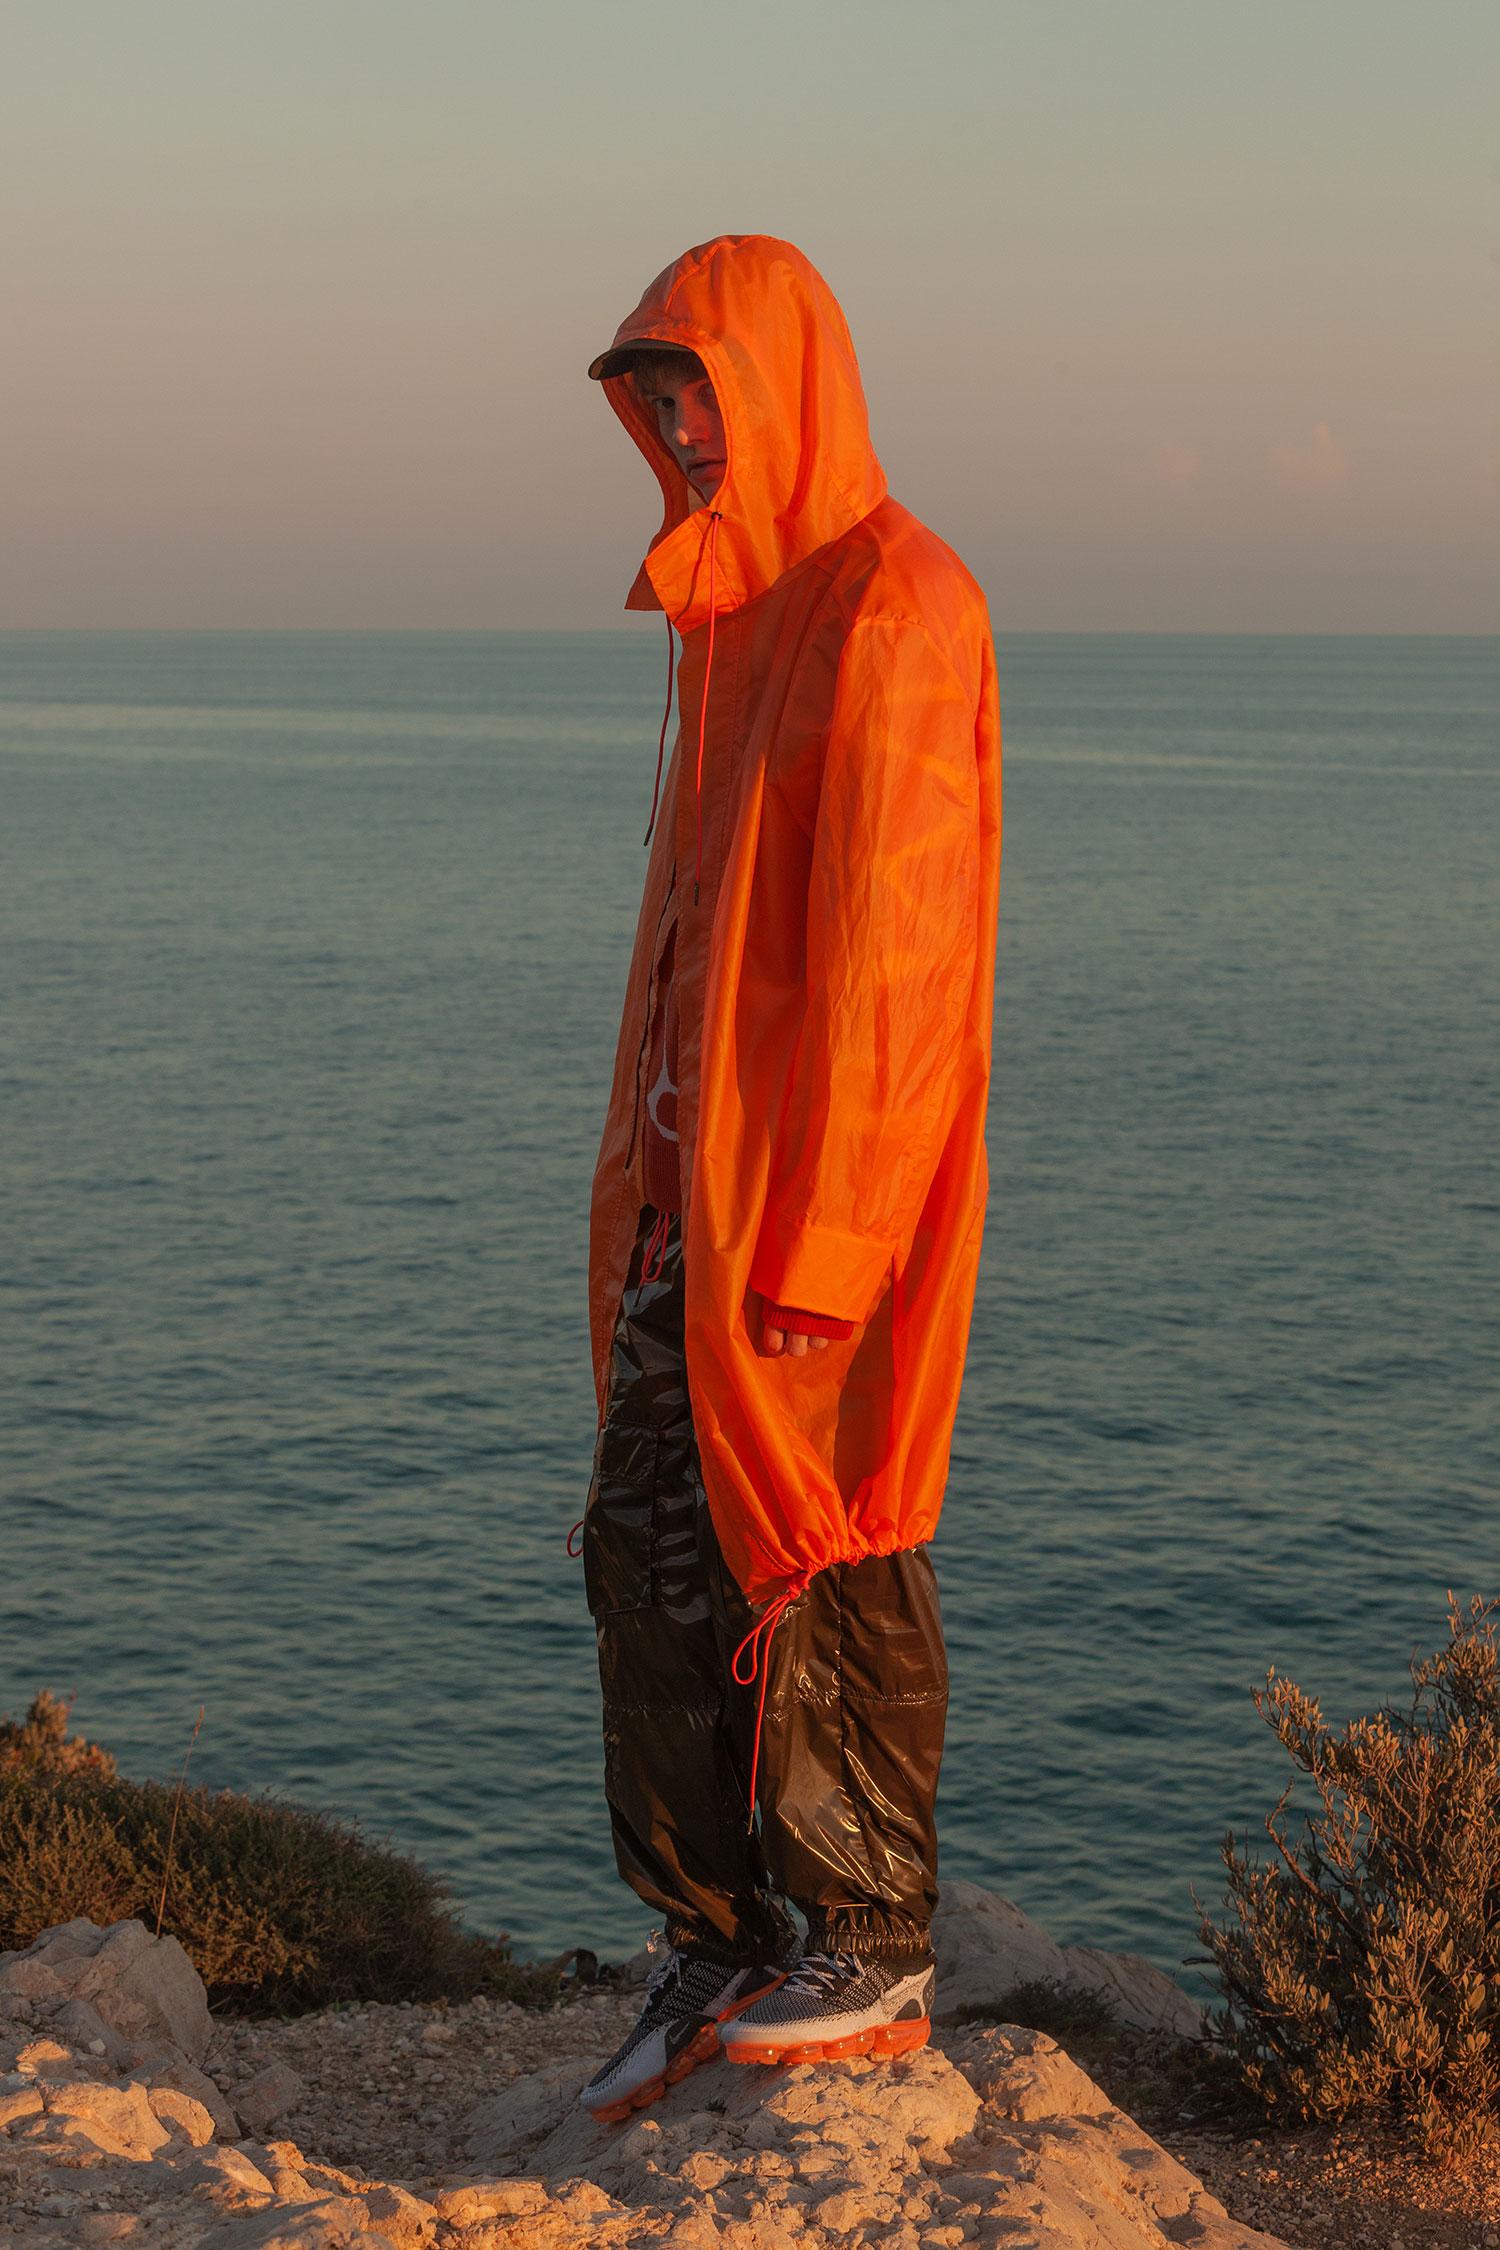 Photo: Chris Vidal. Styling: Tuomas Laitinen.